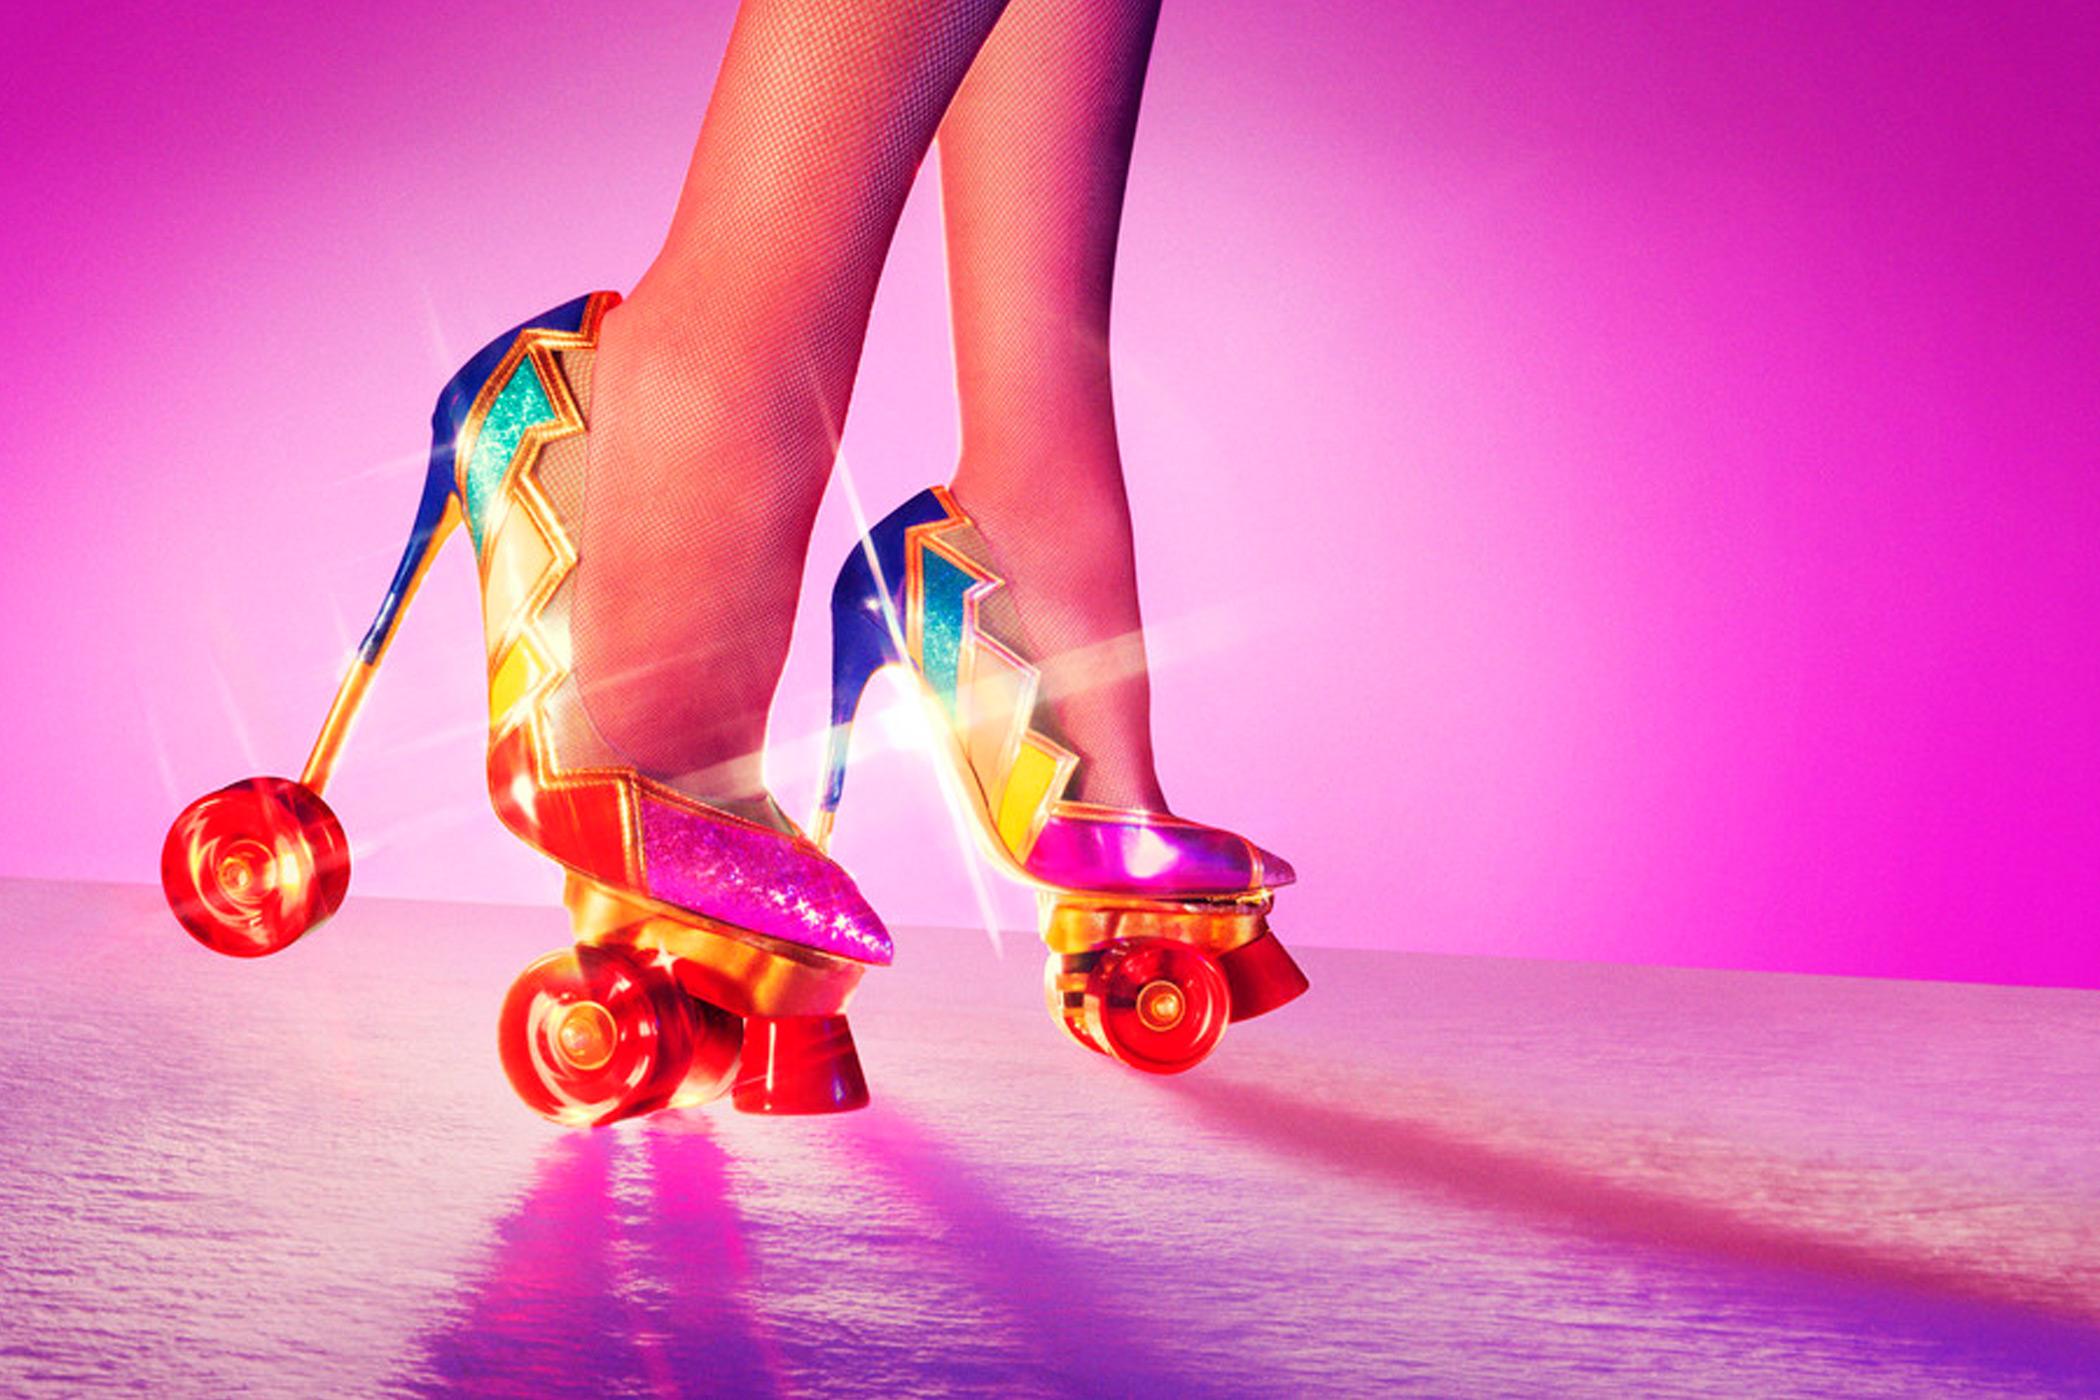 woman wearing high-heels with wheels